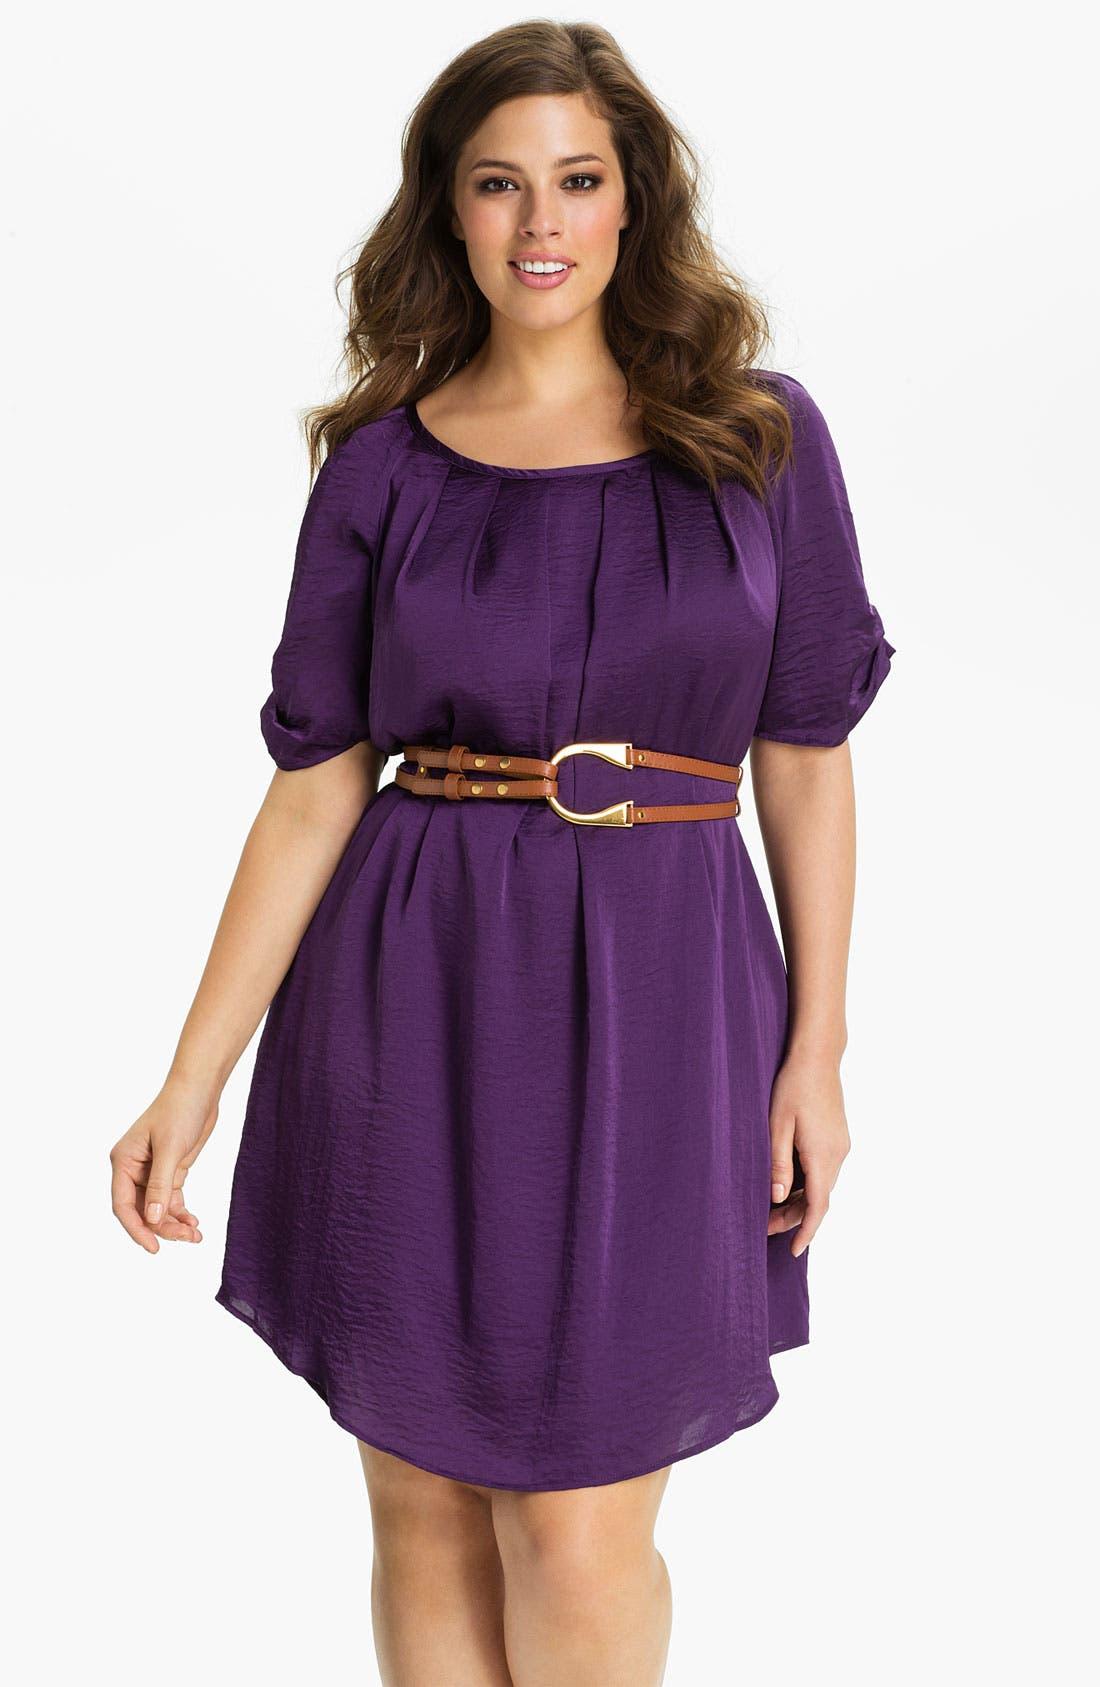 Main Image - Jessica Simpson Belted Scoop Neck Dress (Plus)